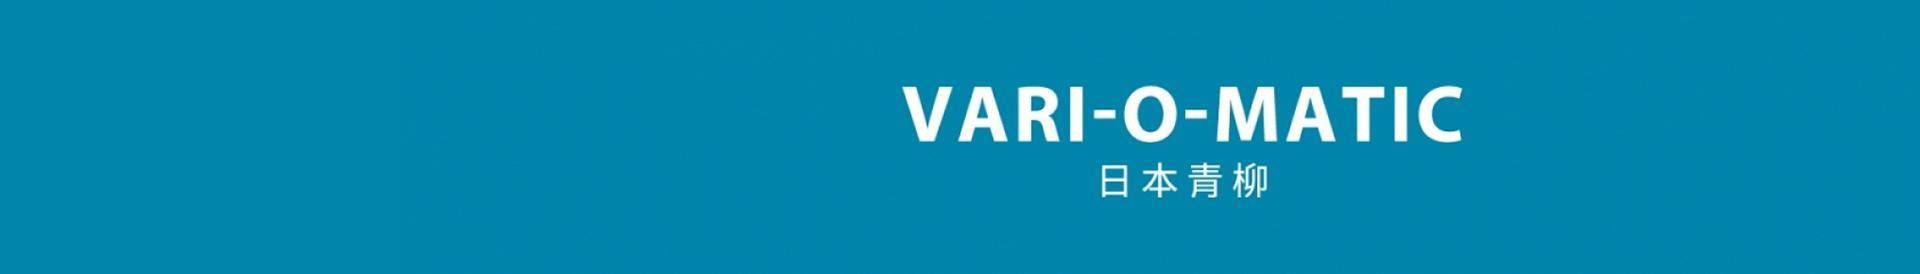 Logo Variomatic Renown